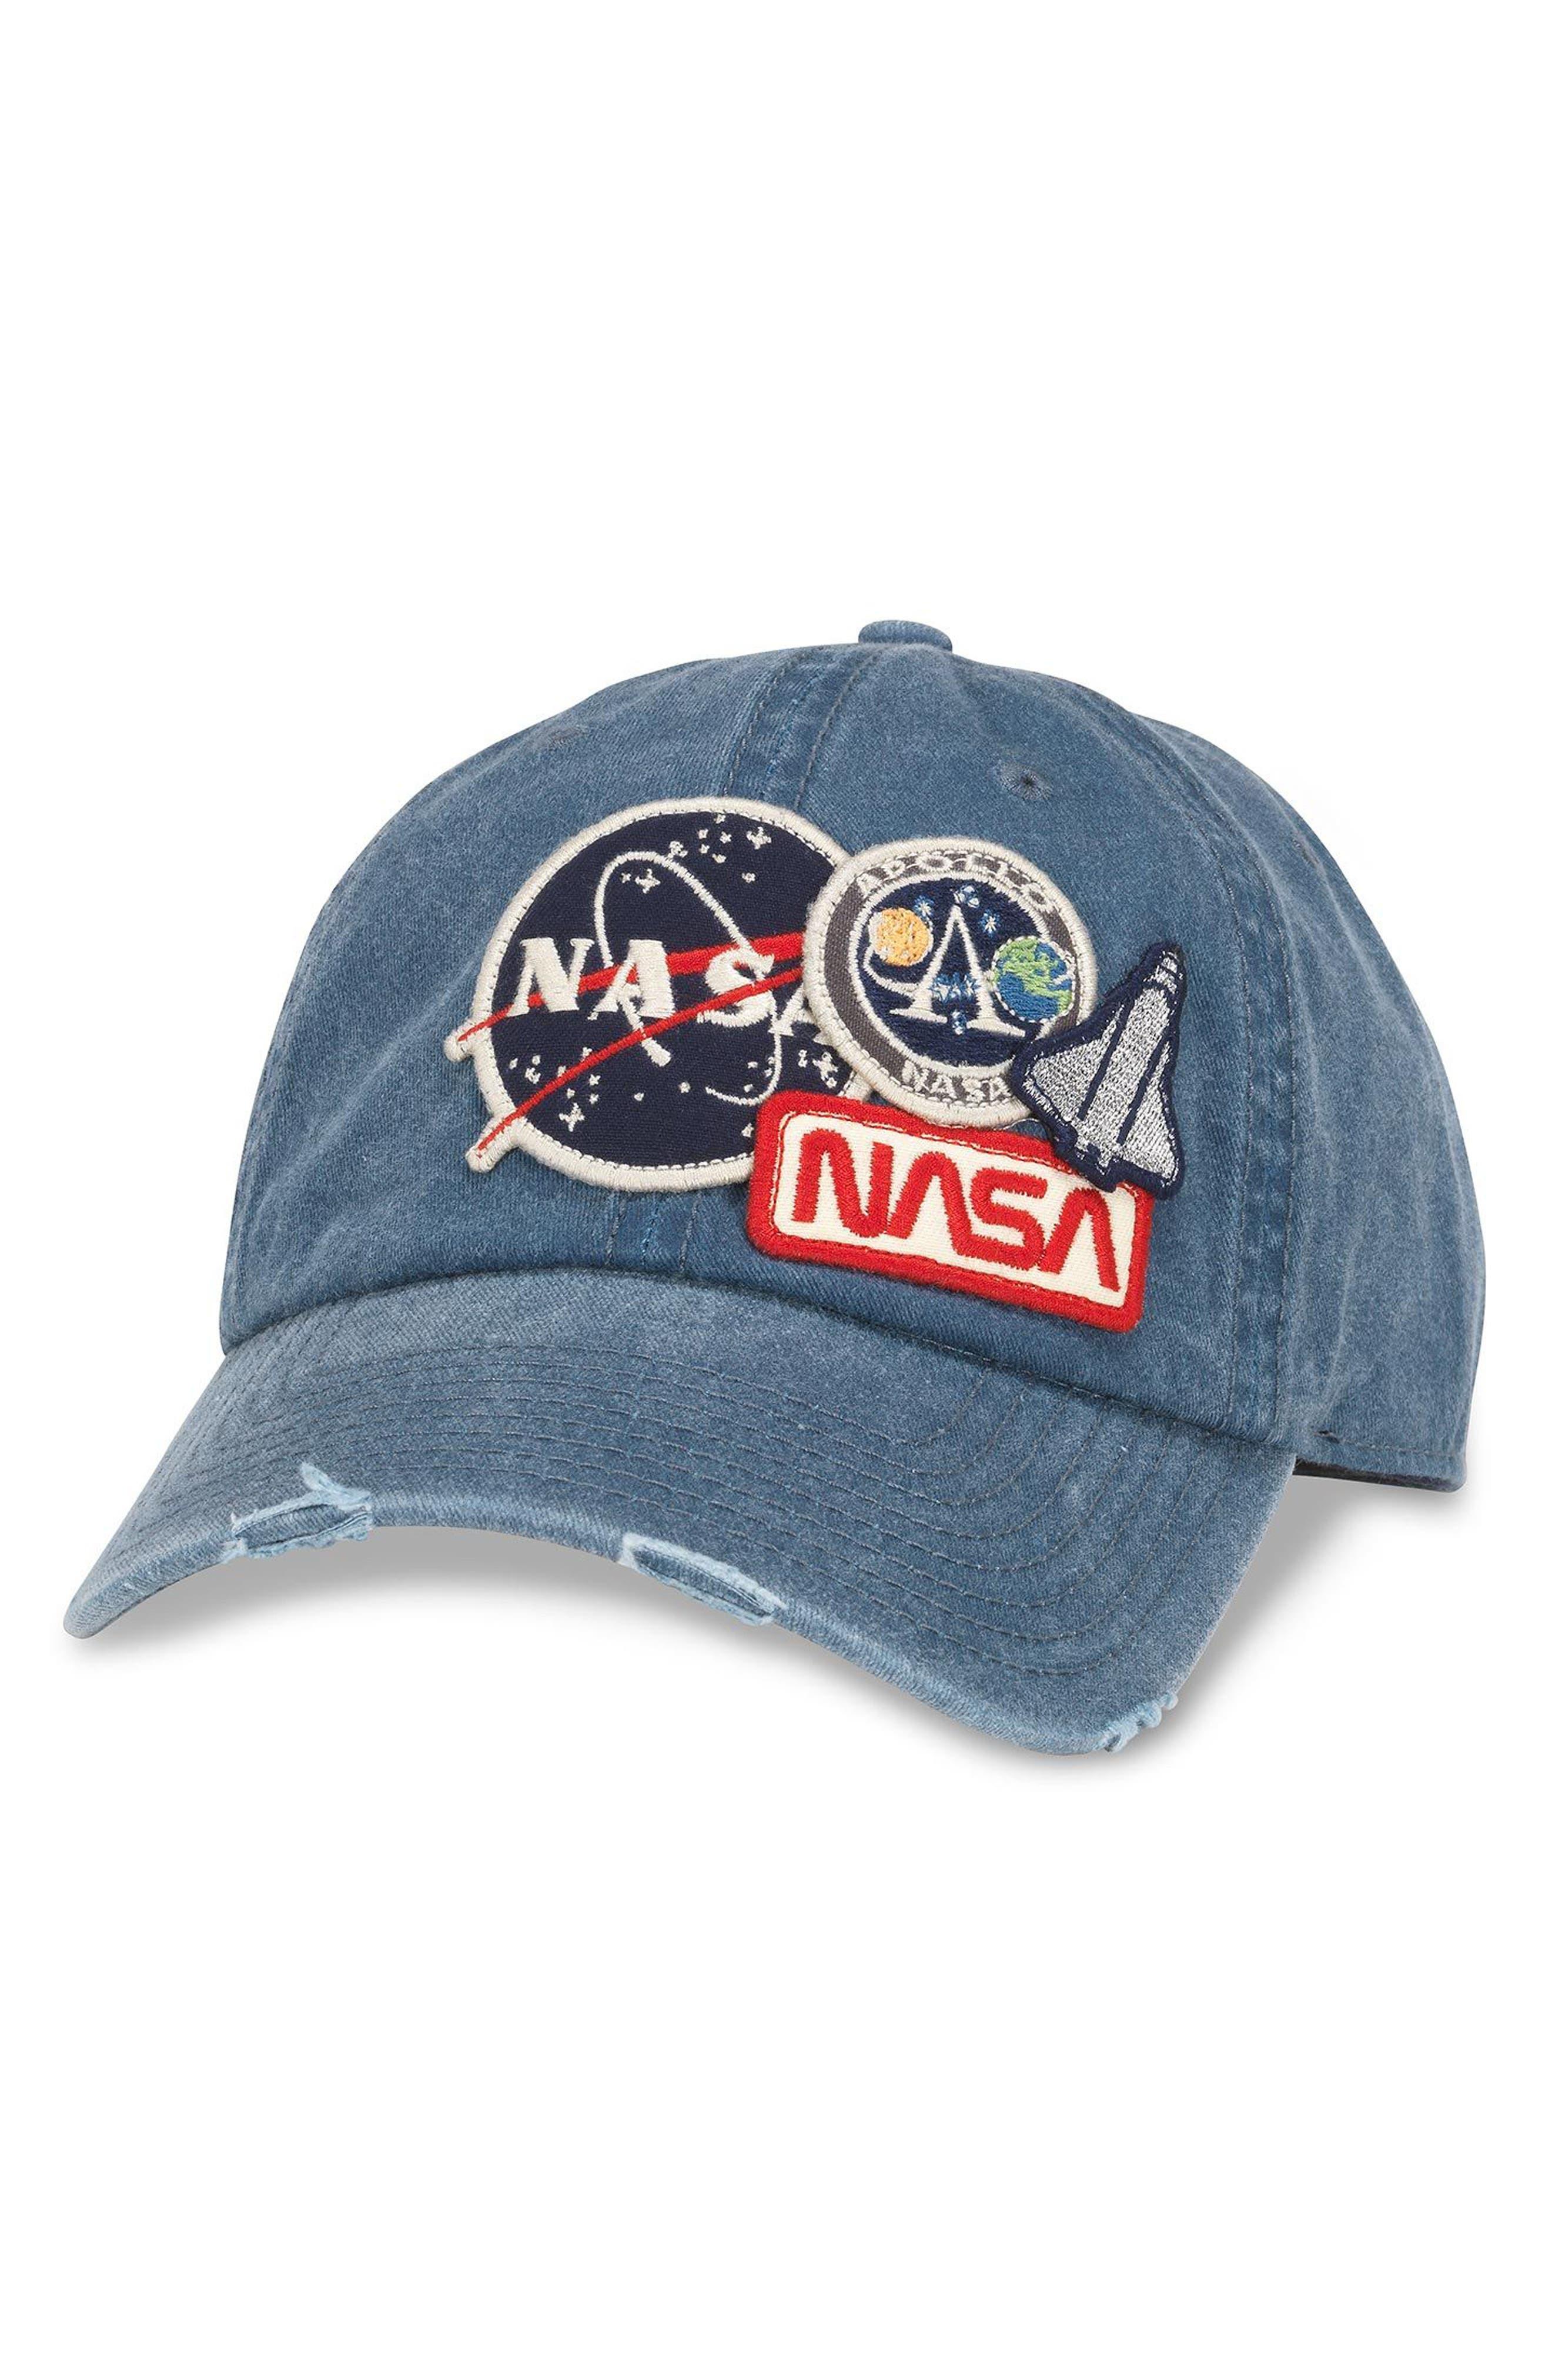 Iconic - NASA Ball Cap,                         Main,                         color, Navy